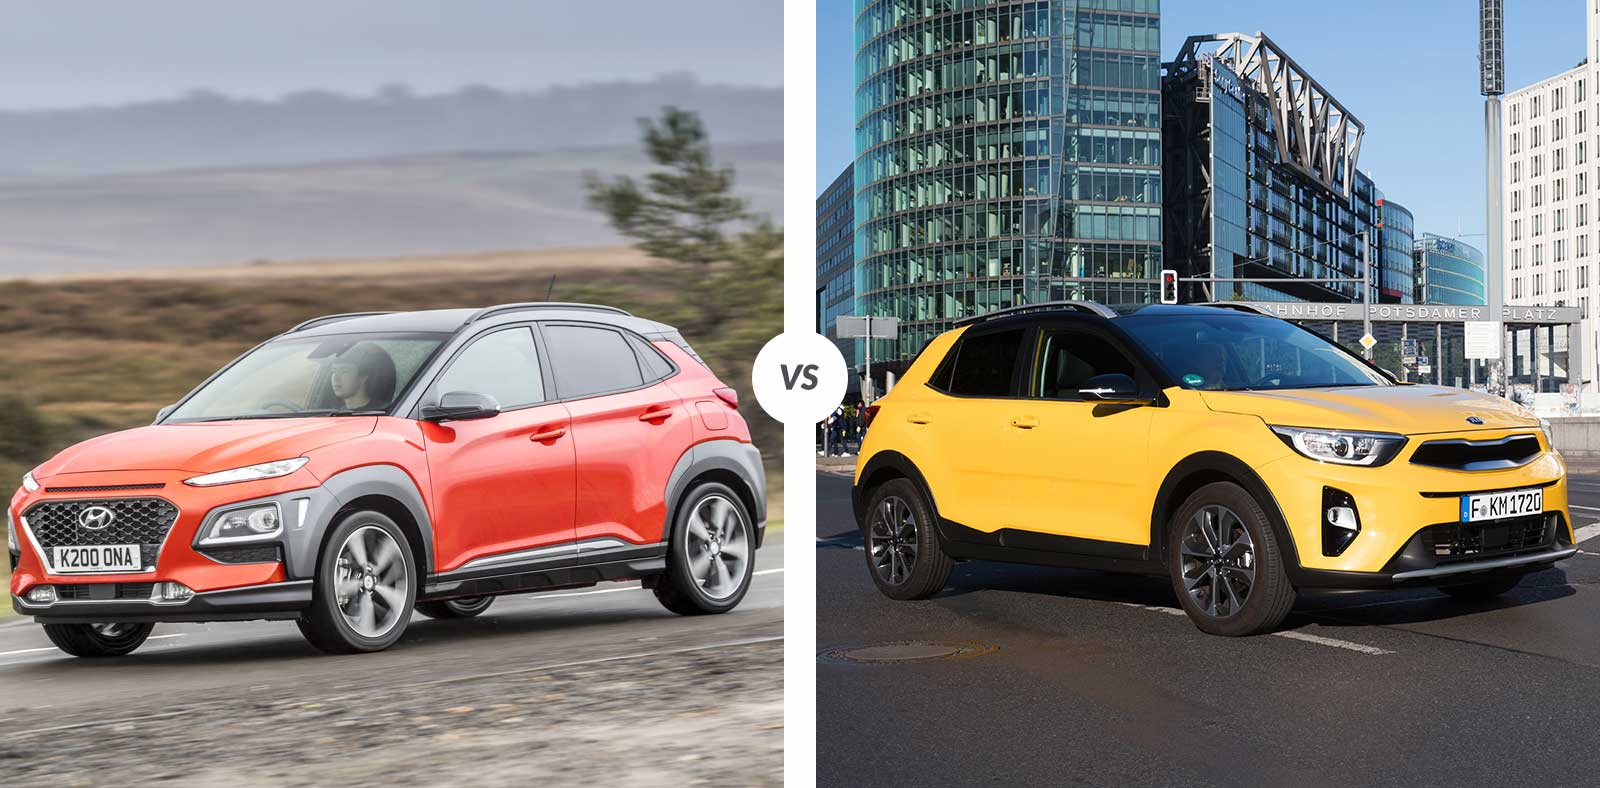 Comparaison : Hyundai Kona vs Kia Stonic